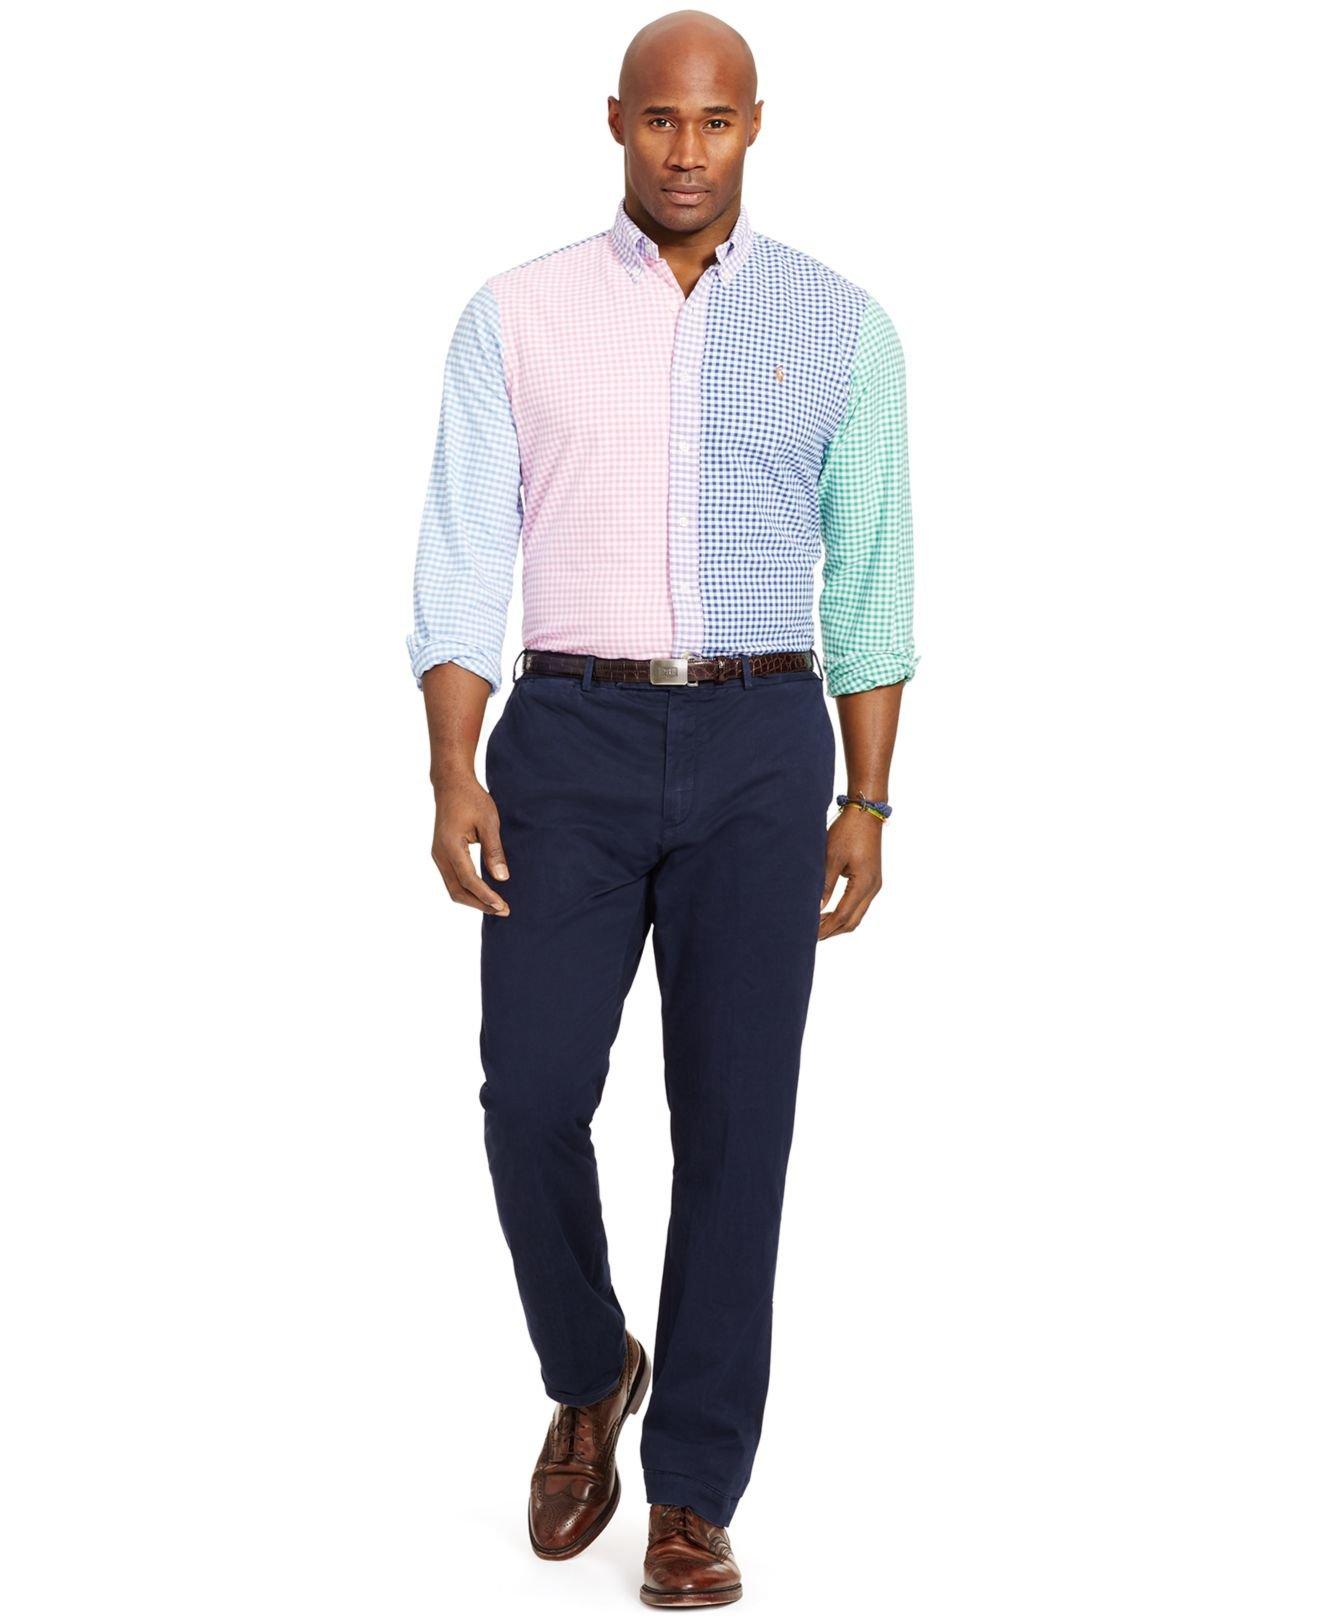 Ralph lauren big and tall mens dress shirts ralph lauren for Polo shirts for men on sale